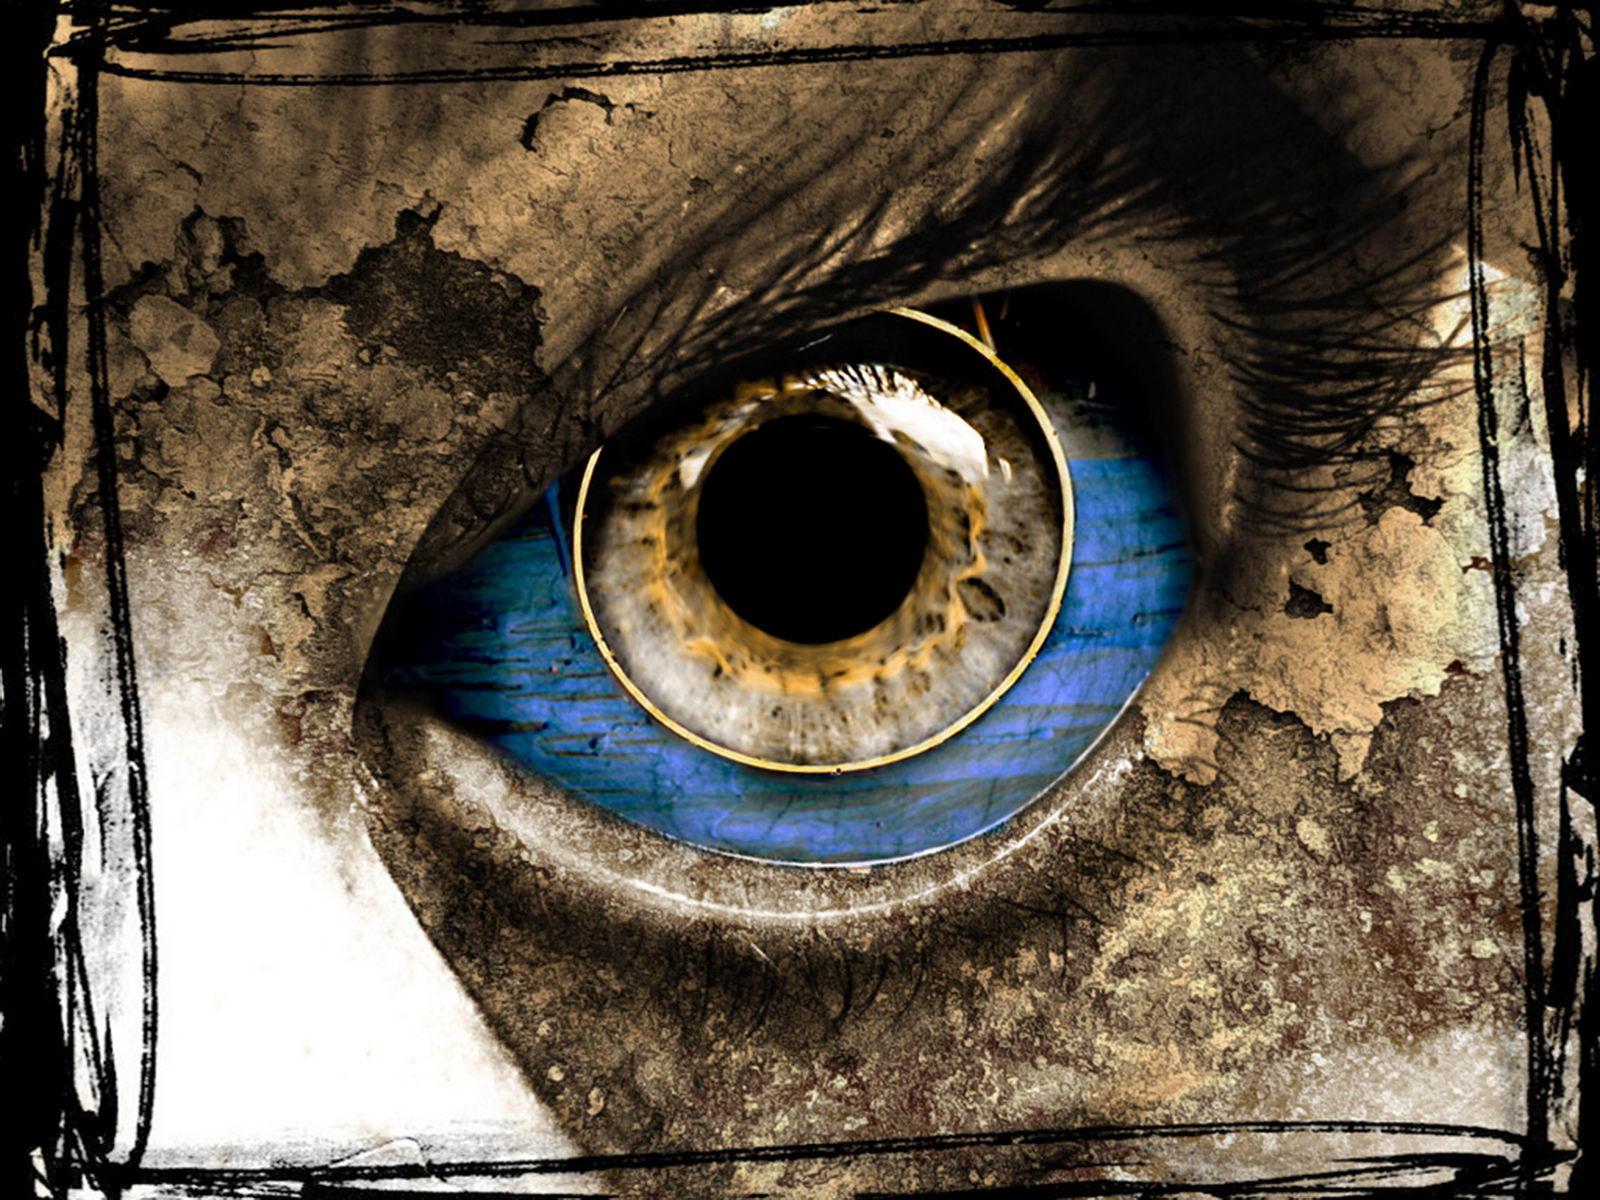 http://4.bp.blogspot.com/-ZiUs5ystZ1k/Ti--rfIh_OI/AAAAAAAADtg/GlxHl7dLrVo/s1600/eye-horror-wallpapers.jpg